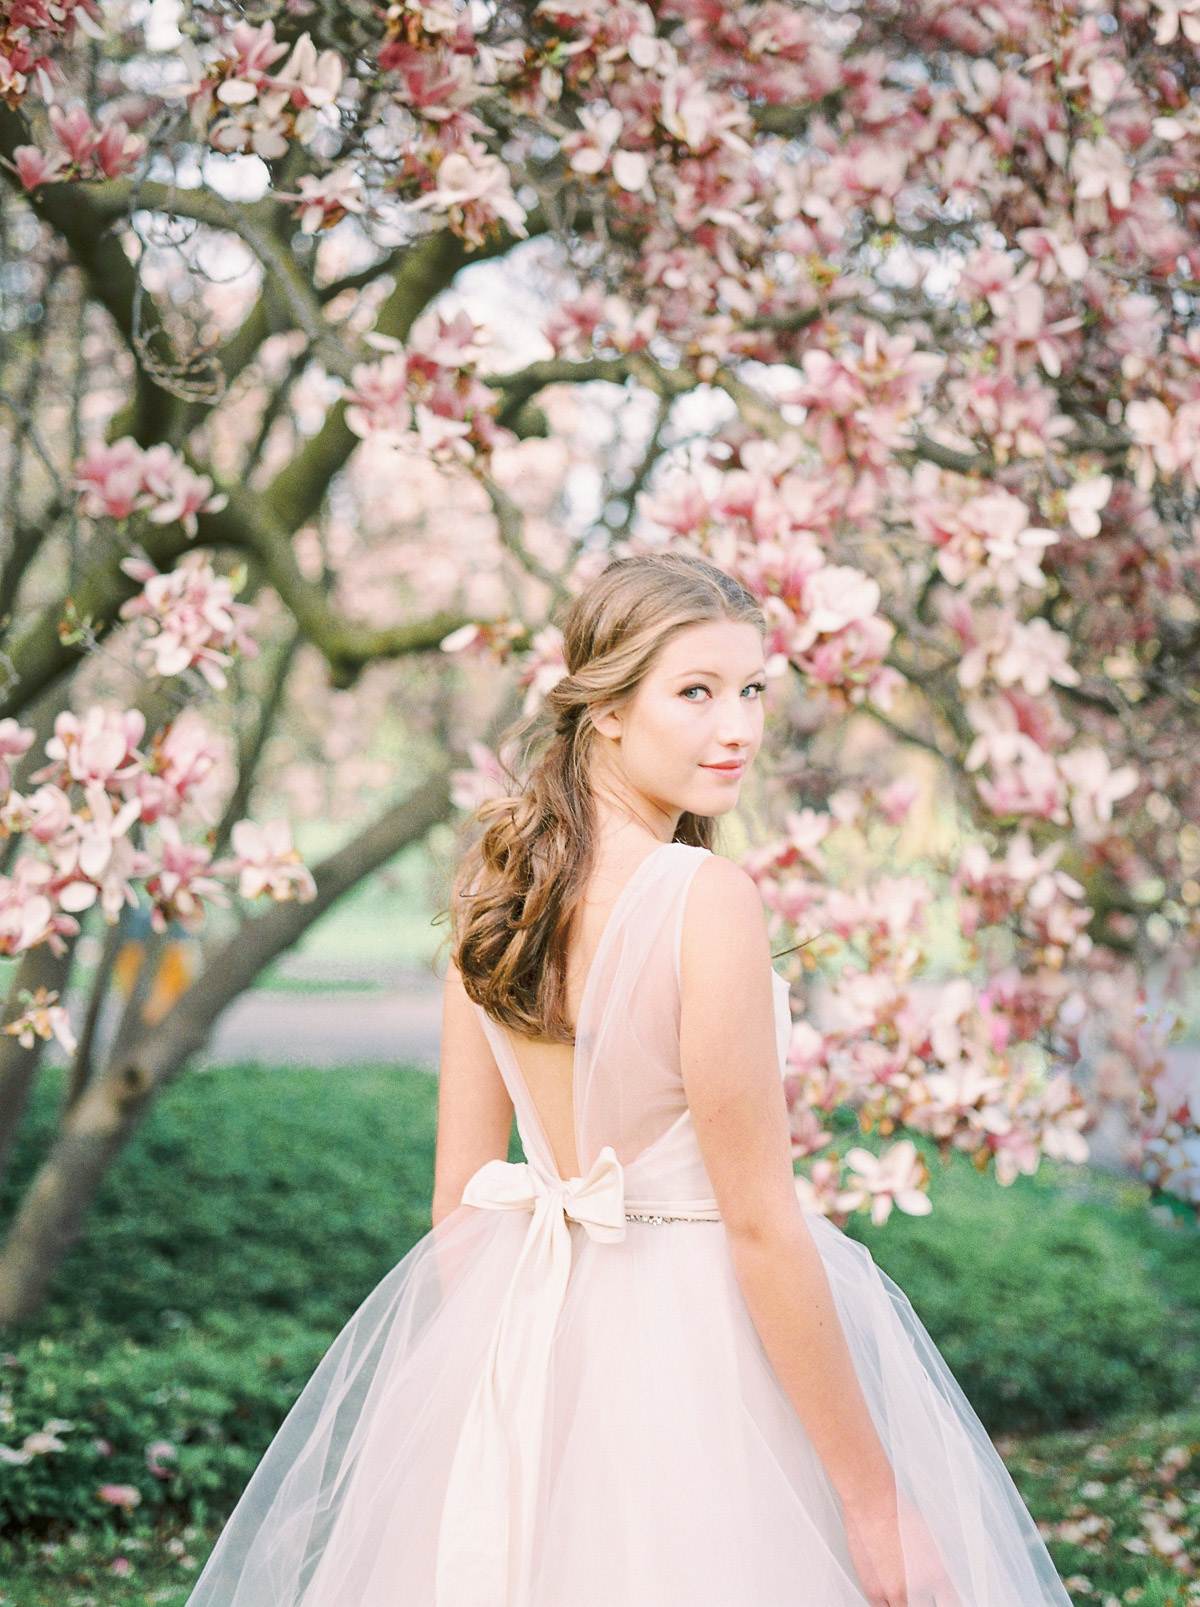 julia-park-photography-vineyard-bride-swish-list-niagara-on-the-lake-wedding-editorial-6.jpg